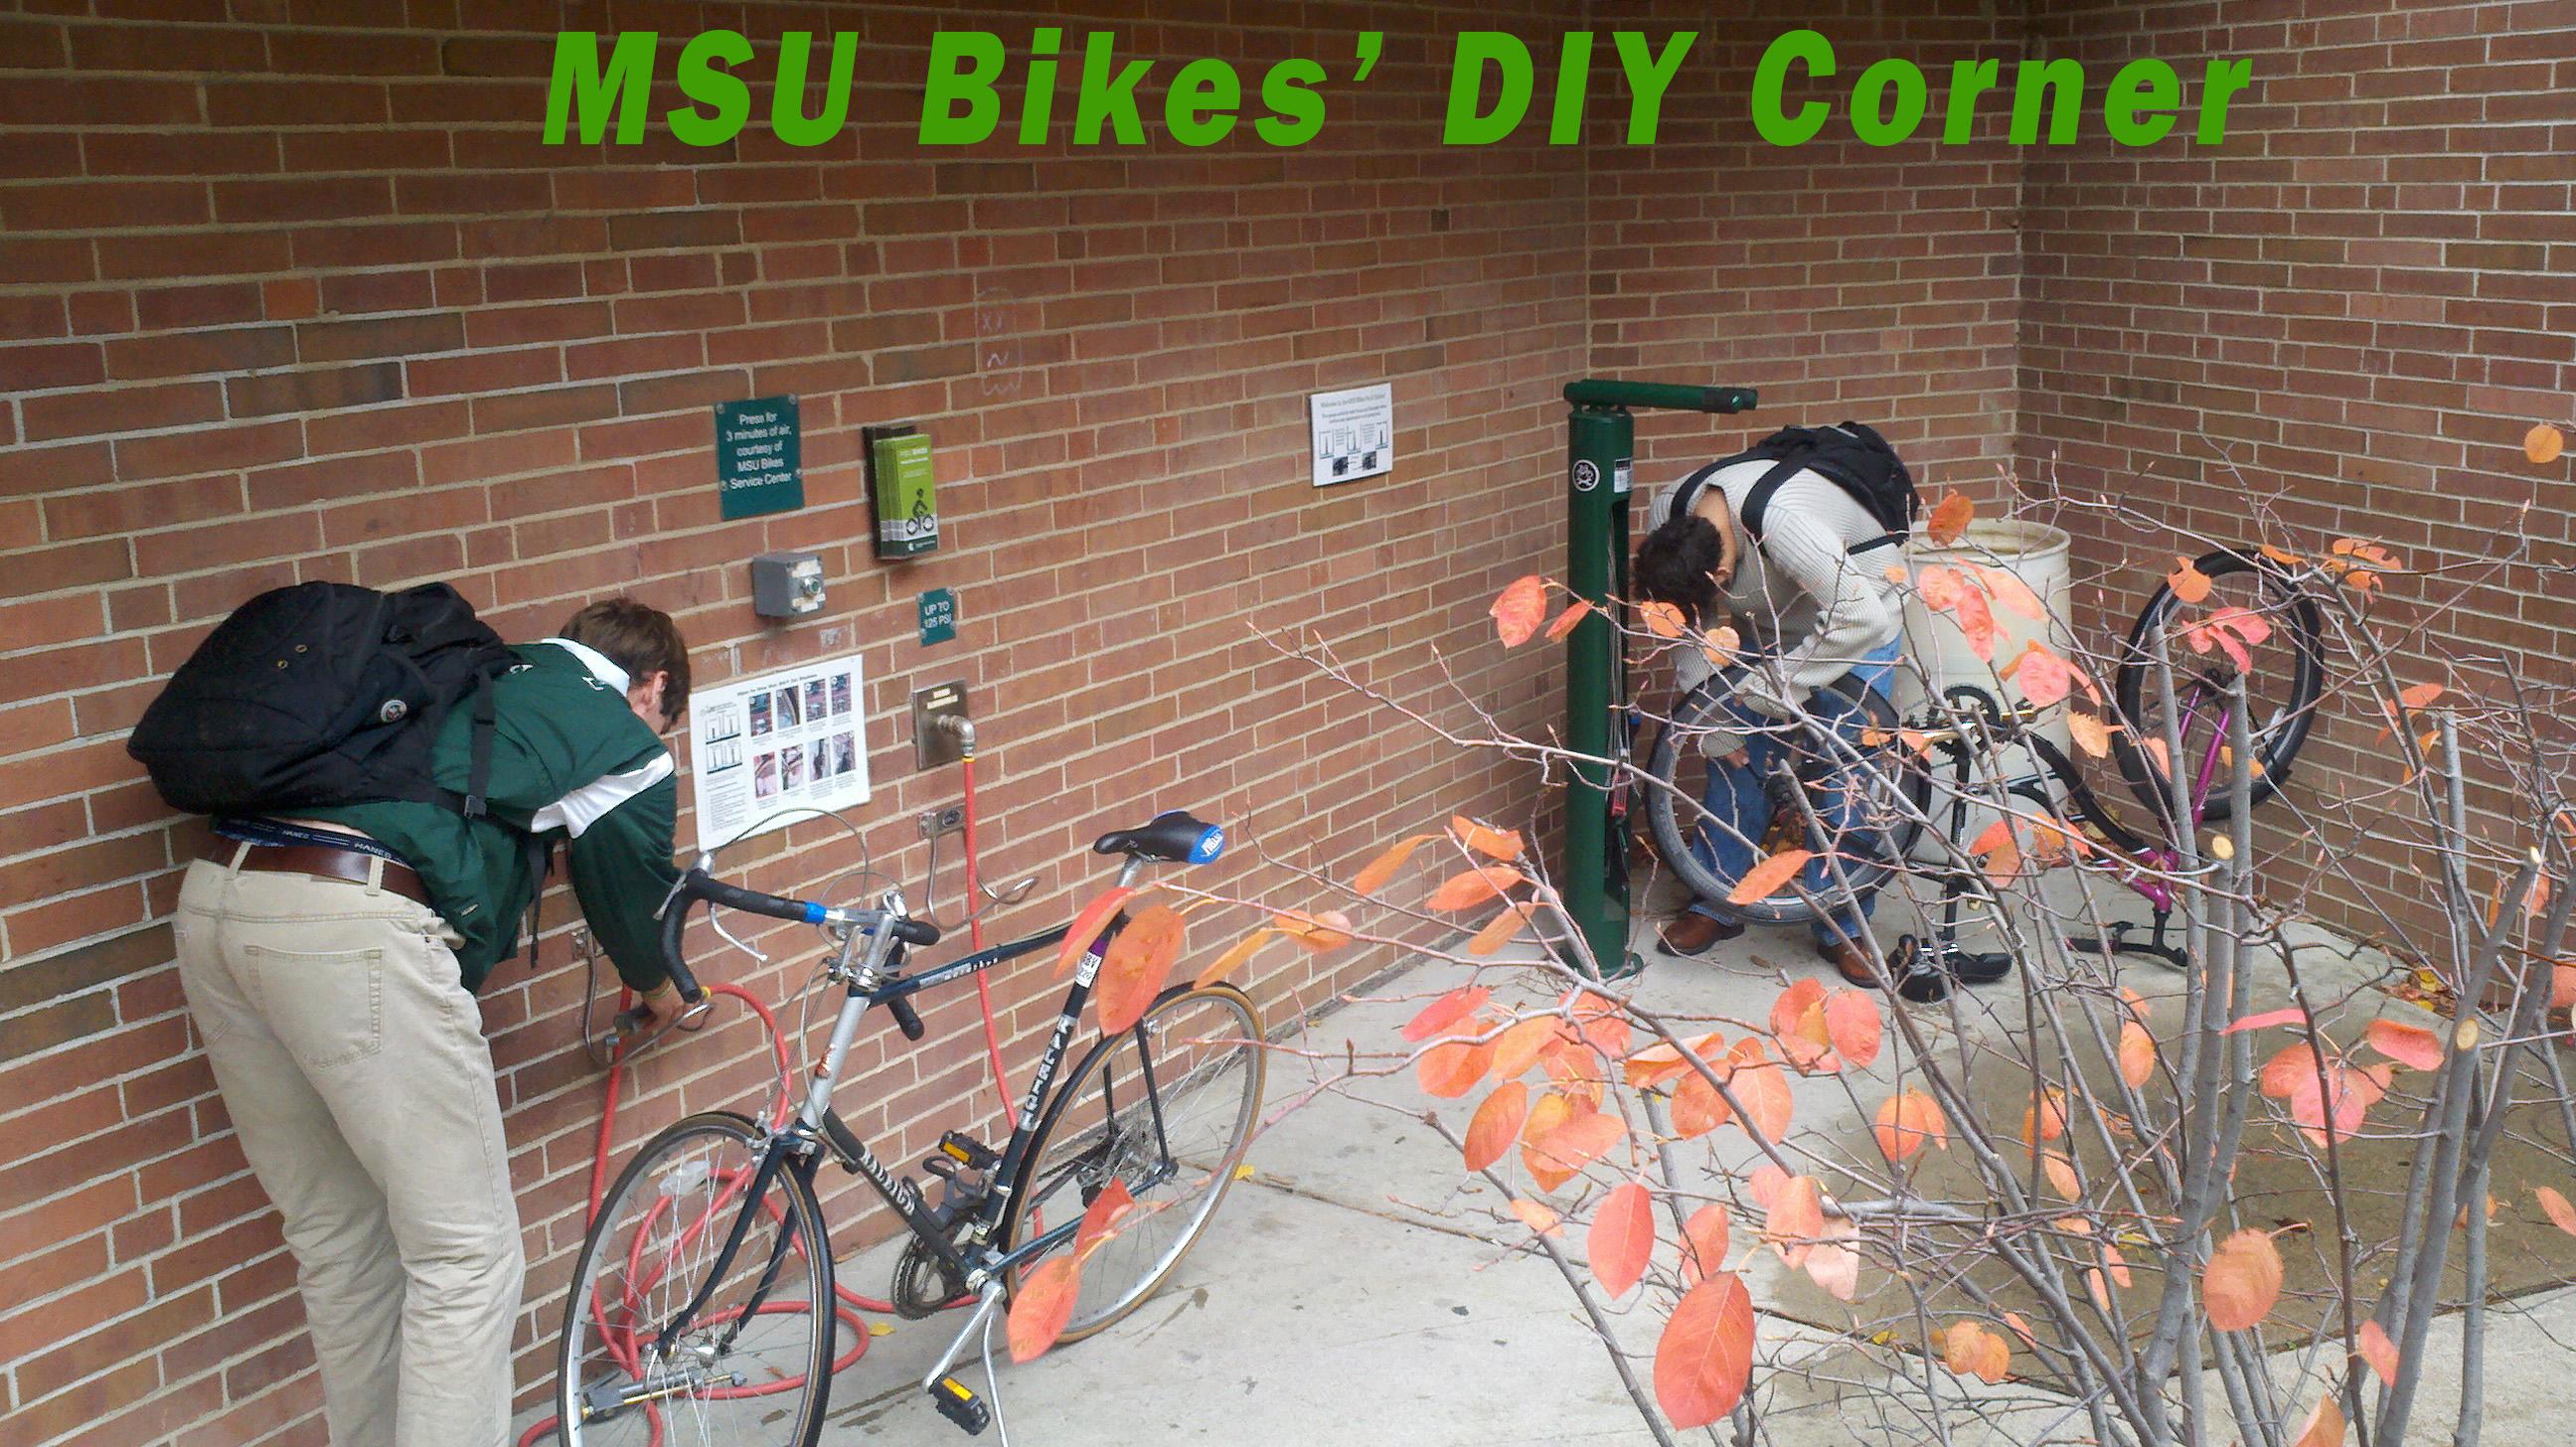 MSU Bikes DIY Corner